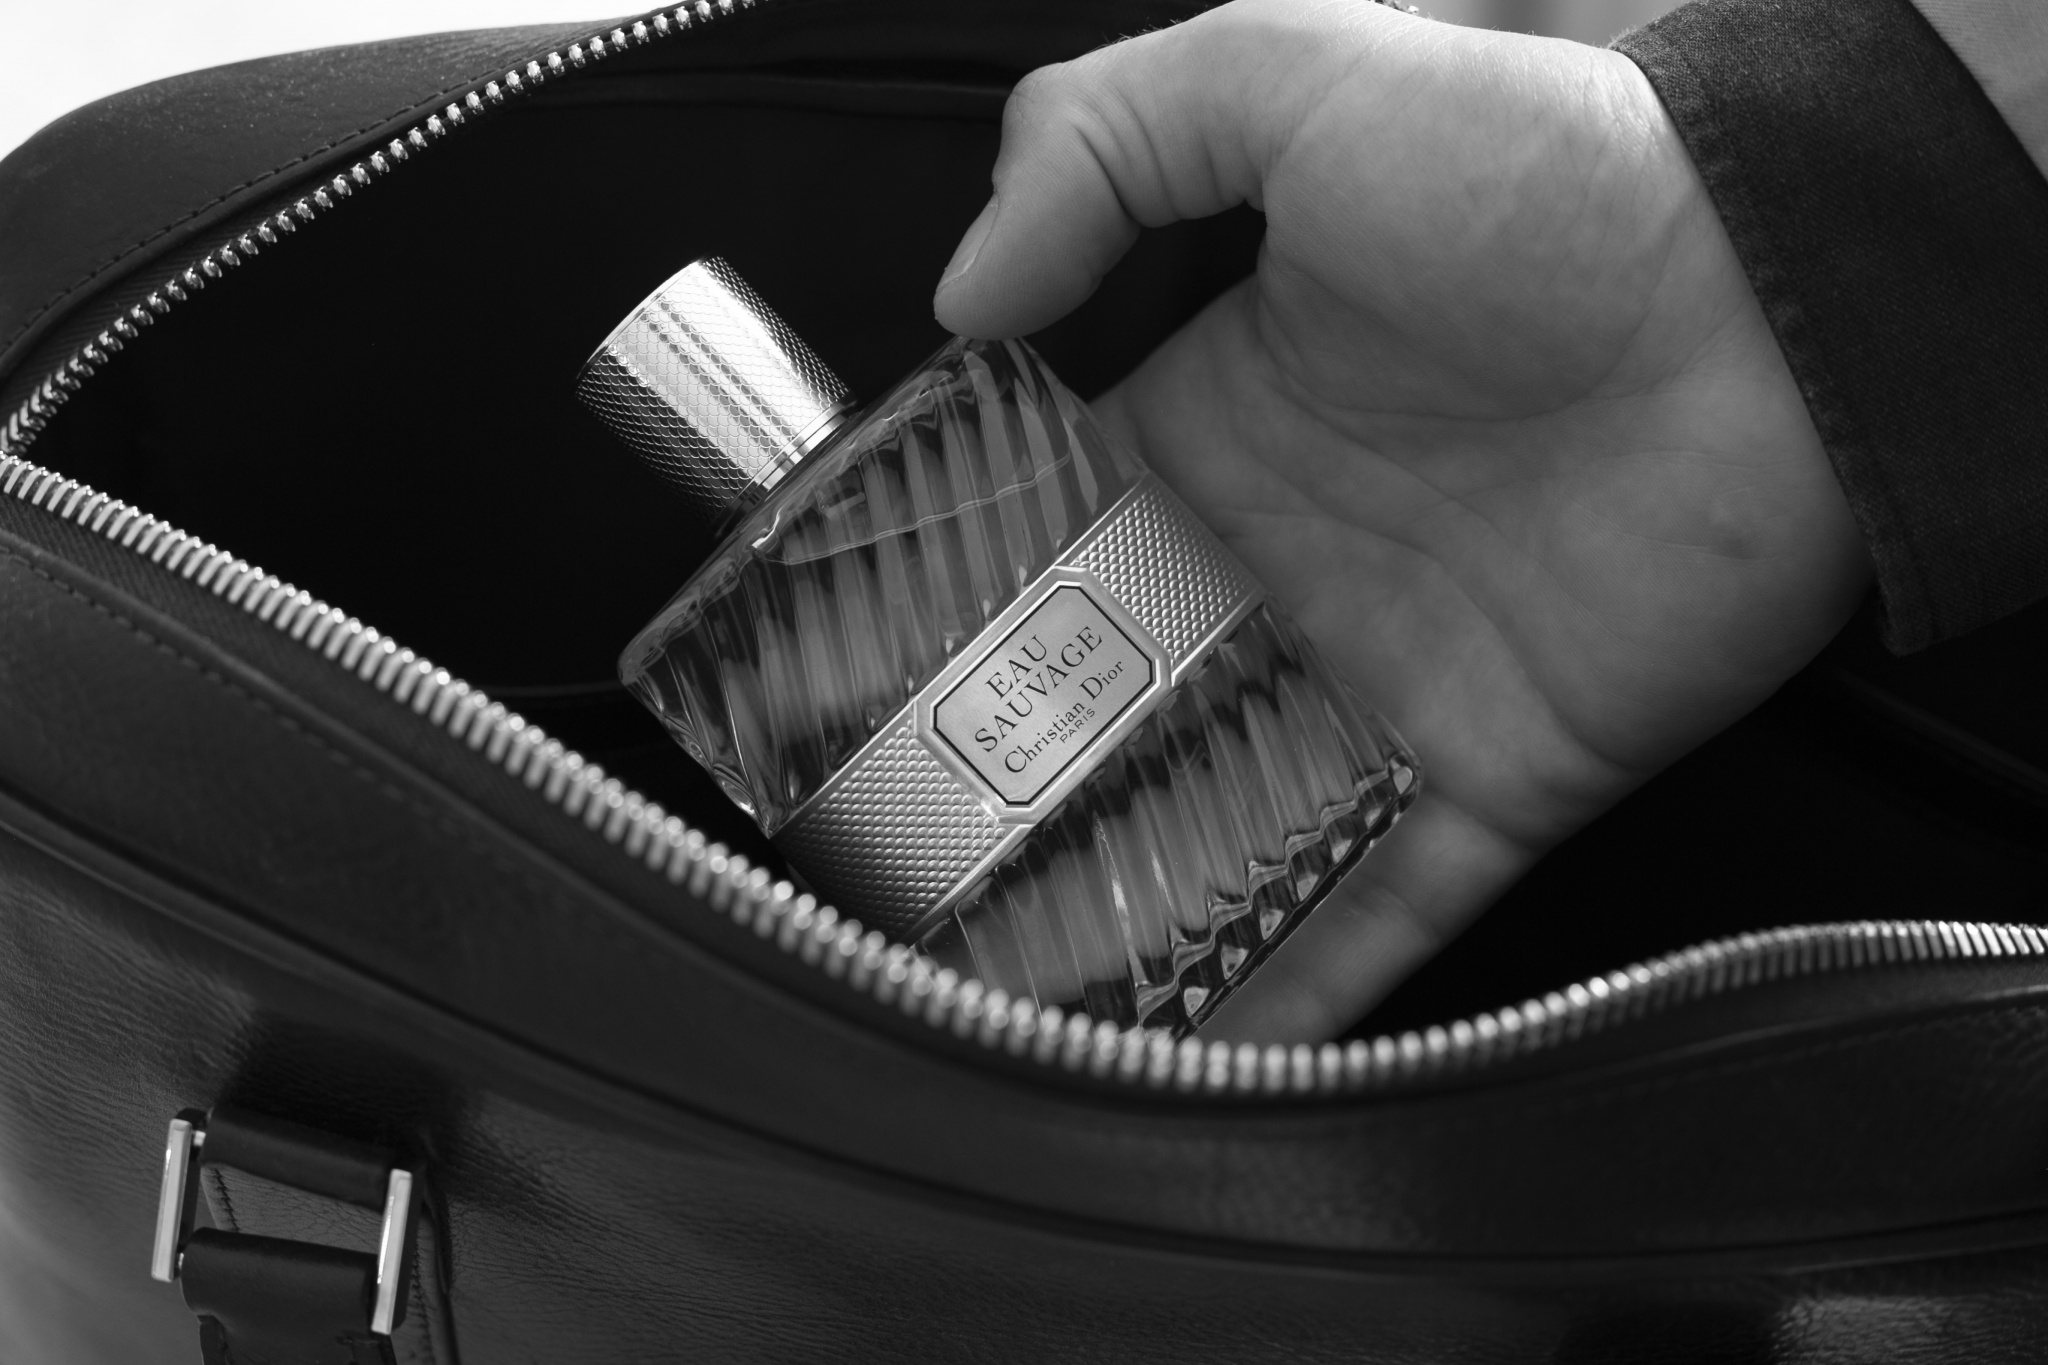 historia perfum eau sauvage